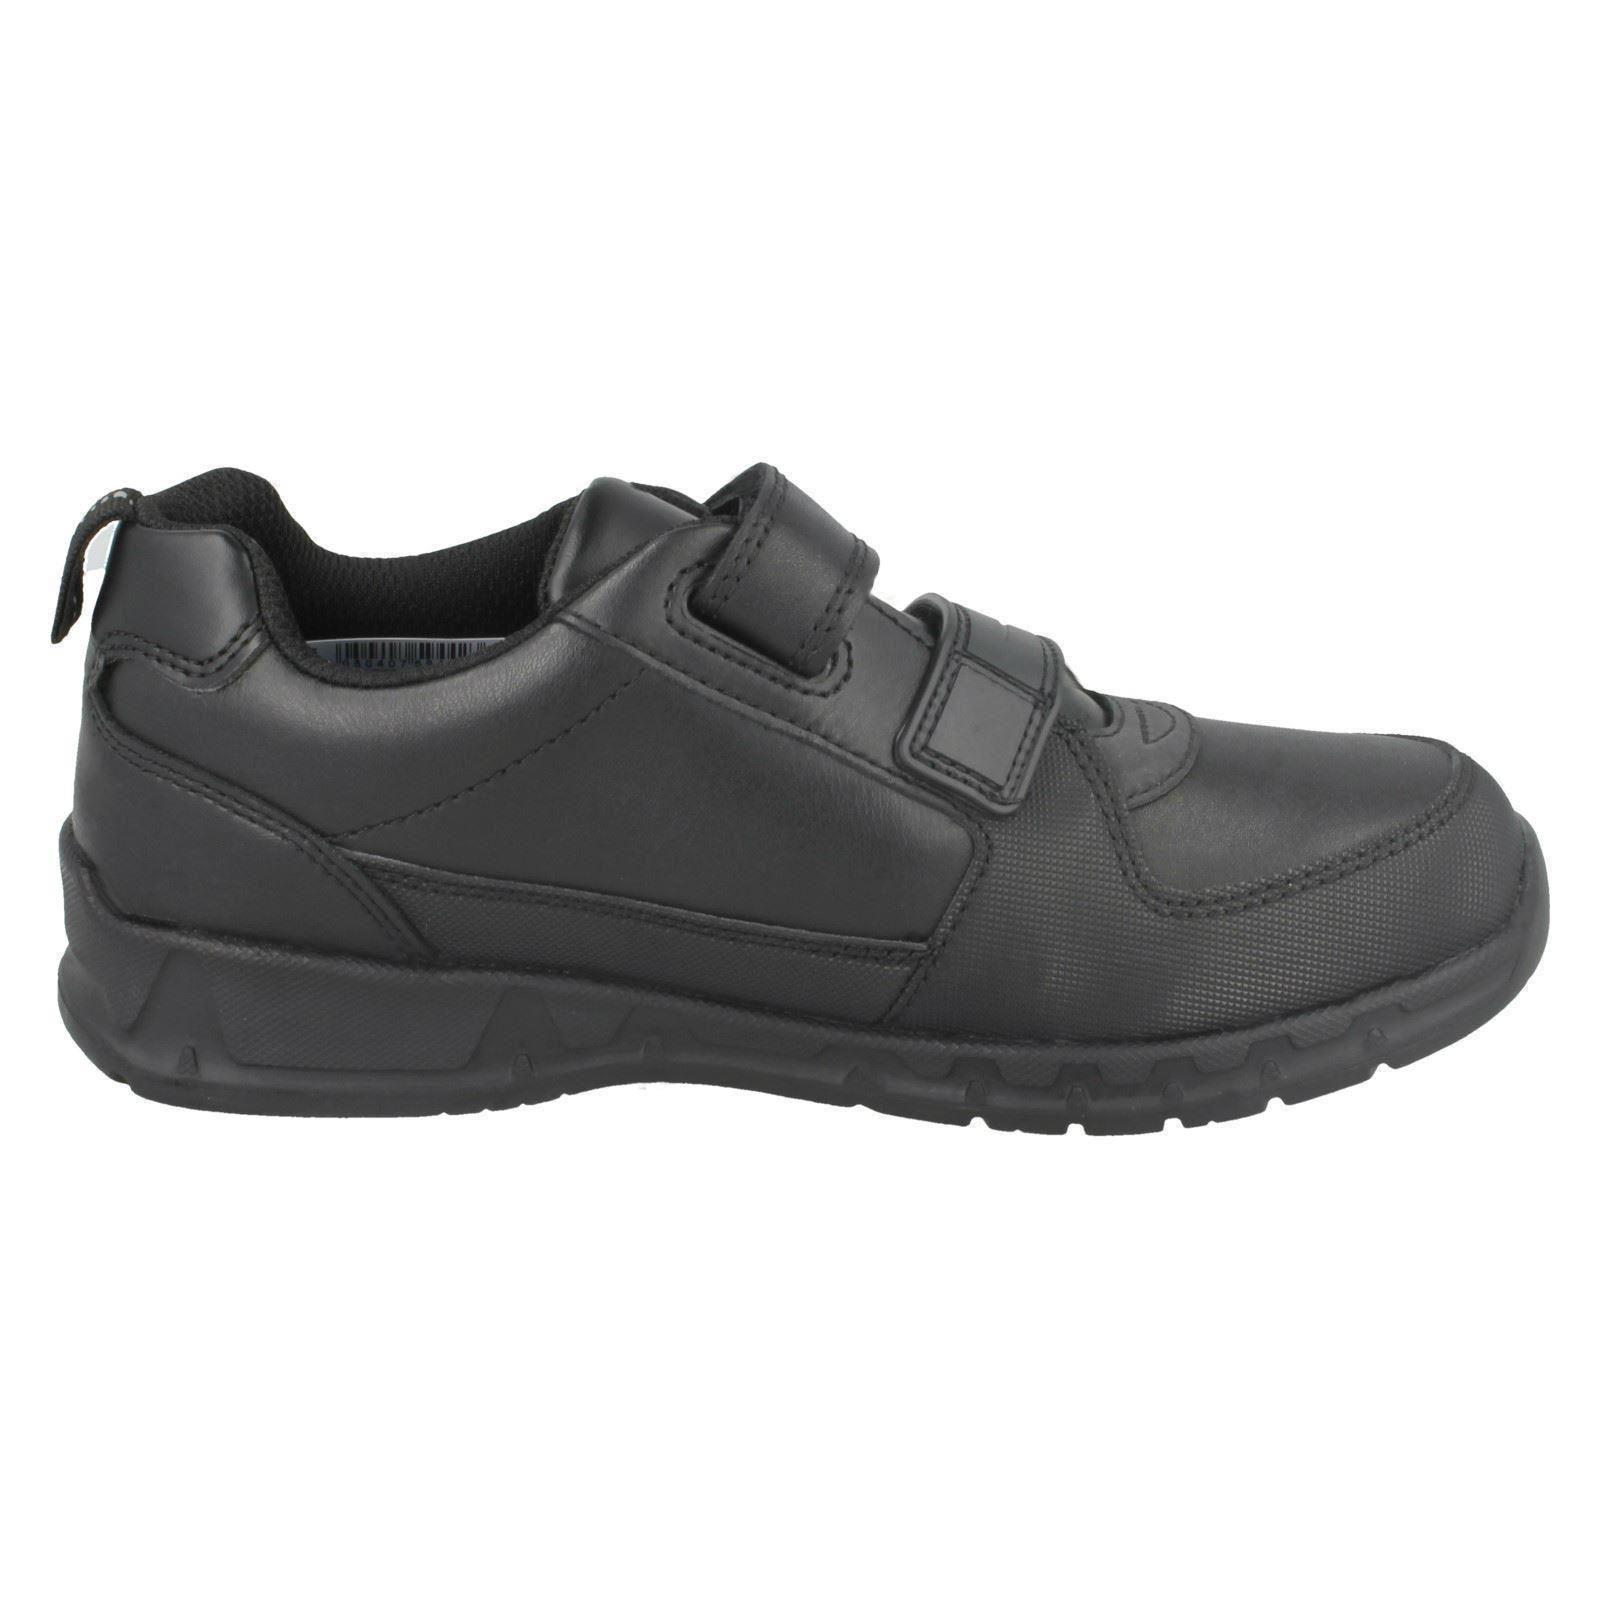 Gloforms By Clarks Boys Double Strap School Shoes Maris Fire